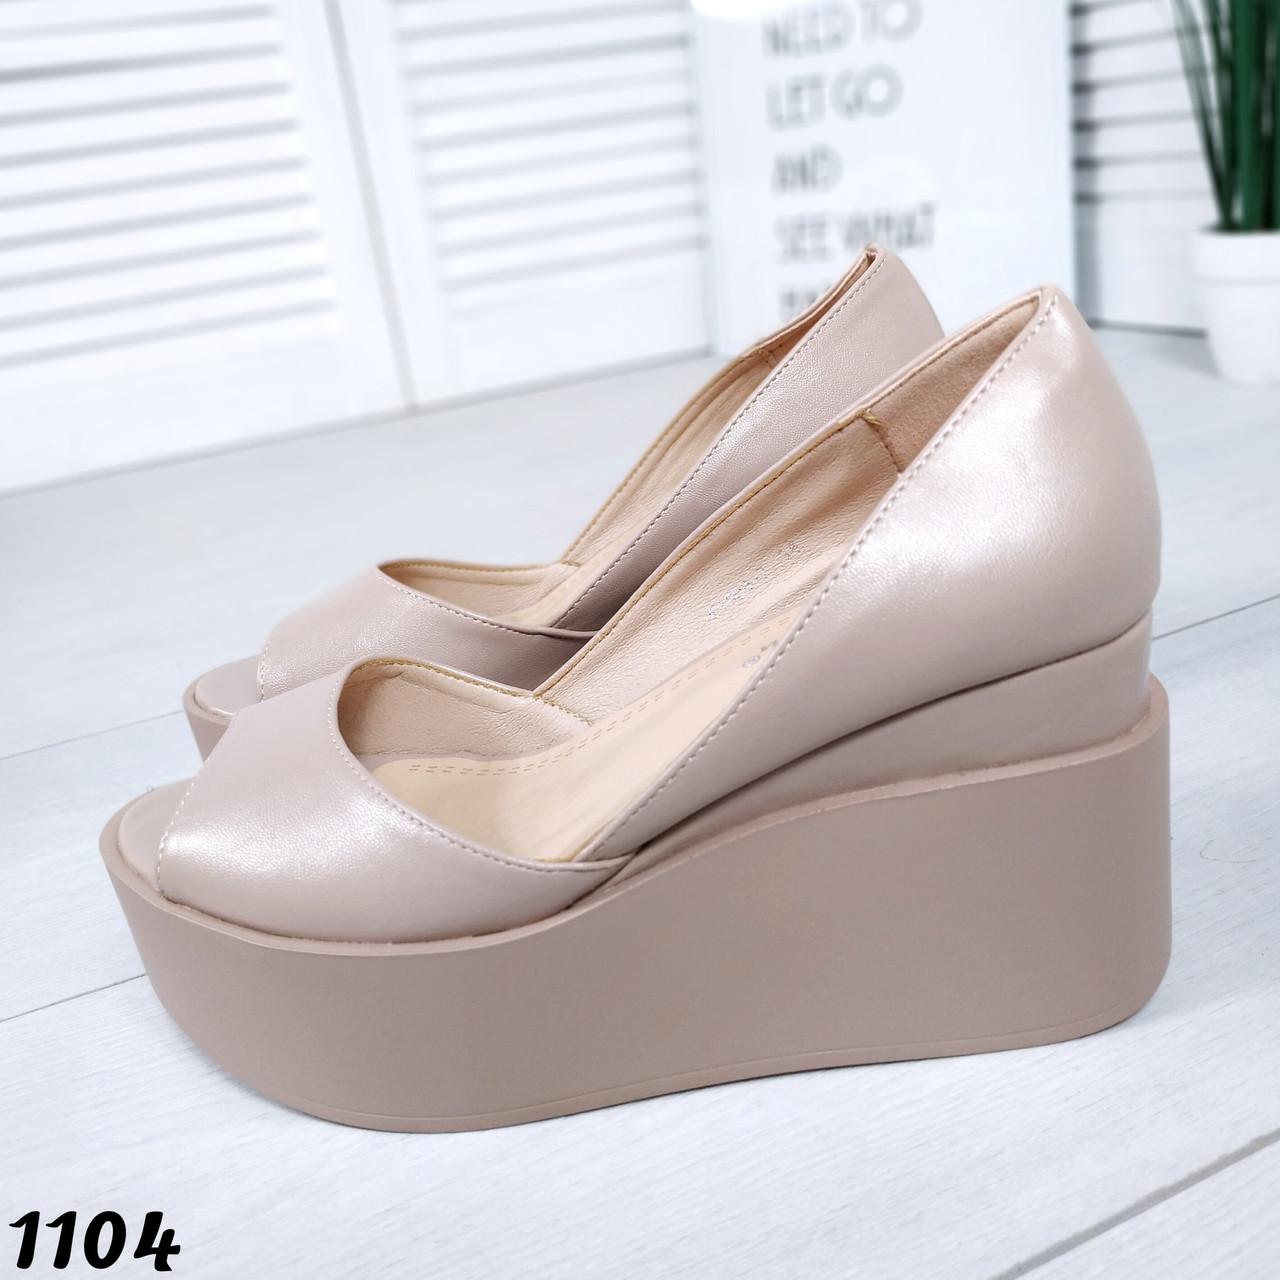 4a532dbccee7 Туфли на танкетке =Merina= бежевые 40 размеры - Интернет-магазин обуви TINA  LUX